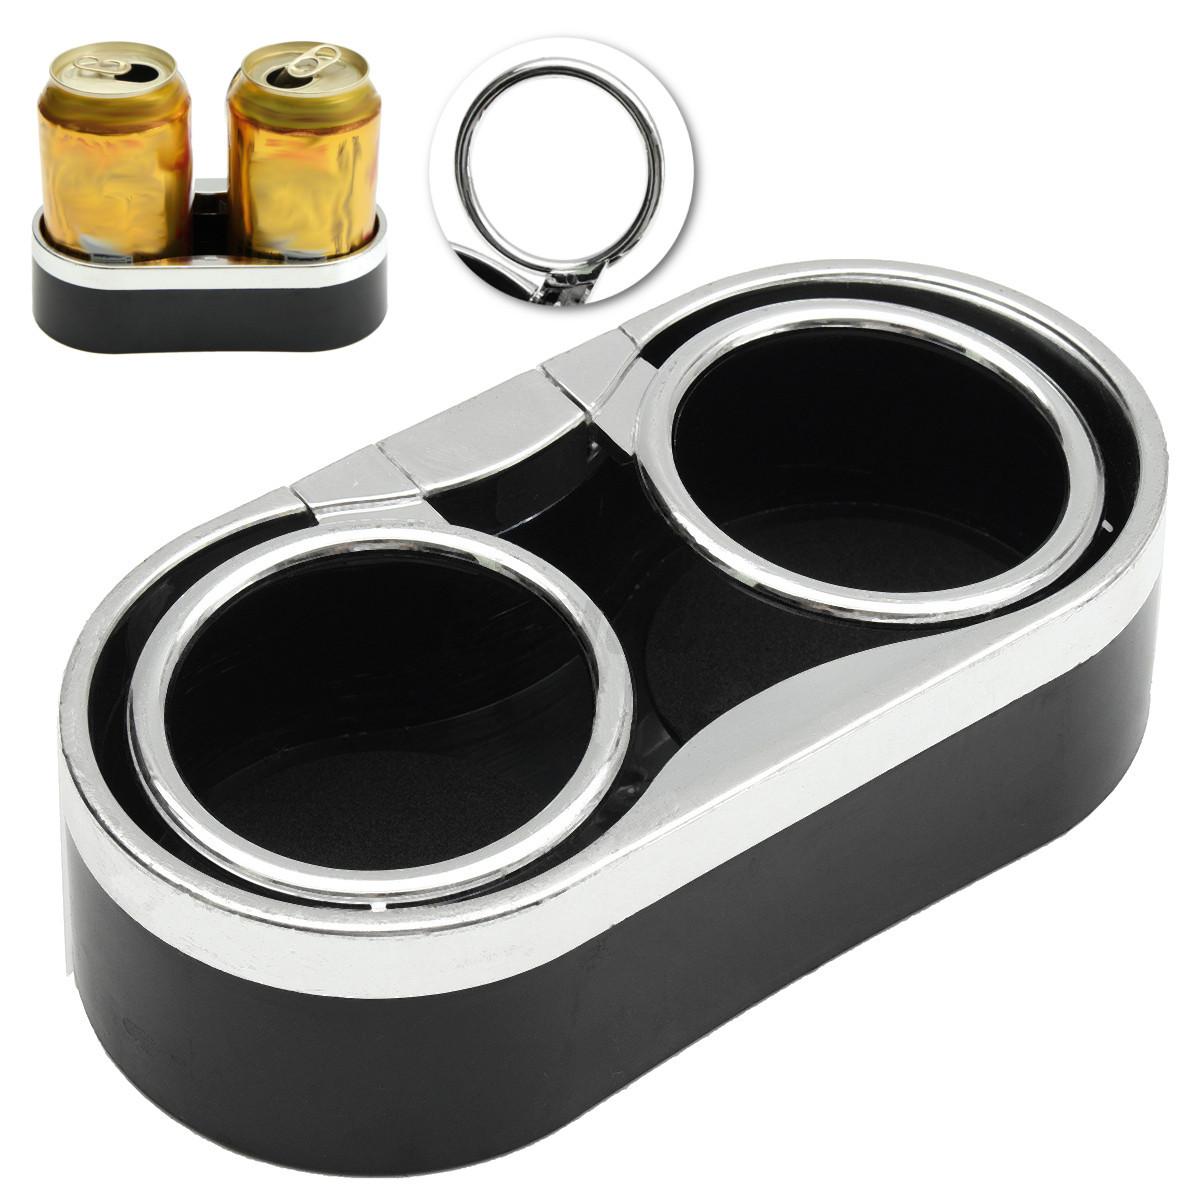 auto car truck adhesive mount dual cup holder drink bottle holder 2 top rings ebay. Black Bedroom Furniture Sets. Home Design Ideas